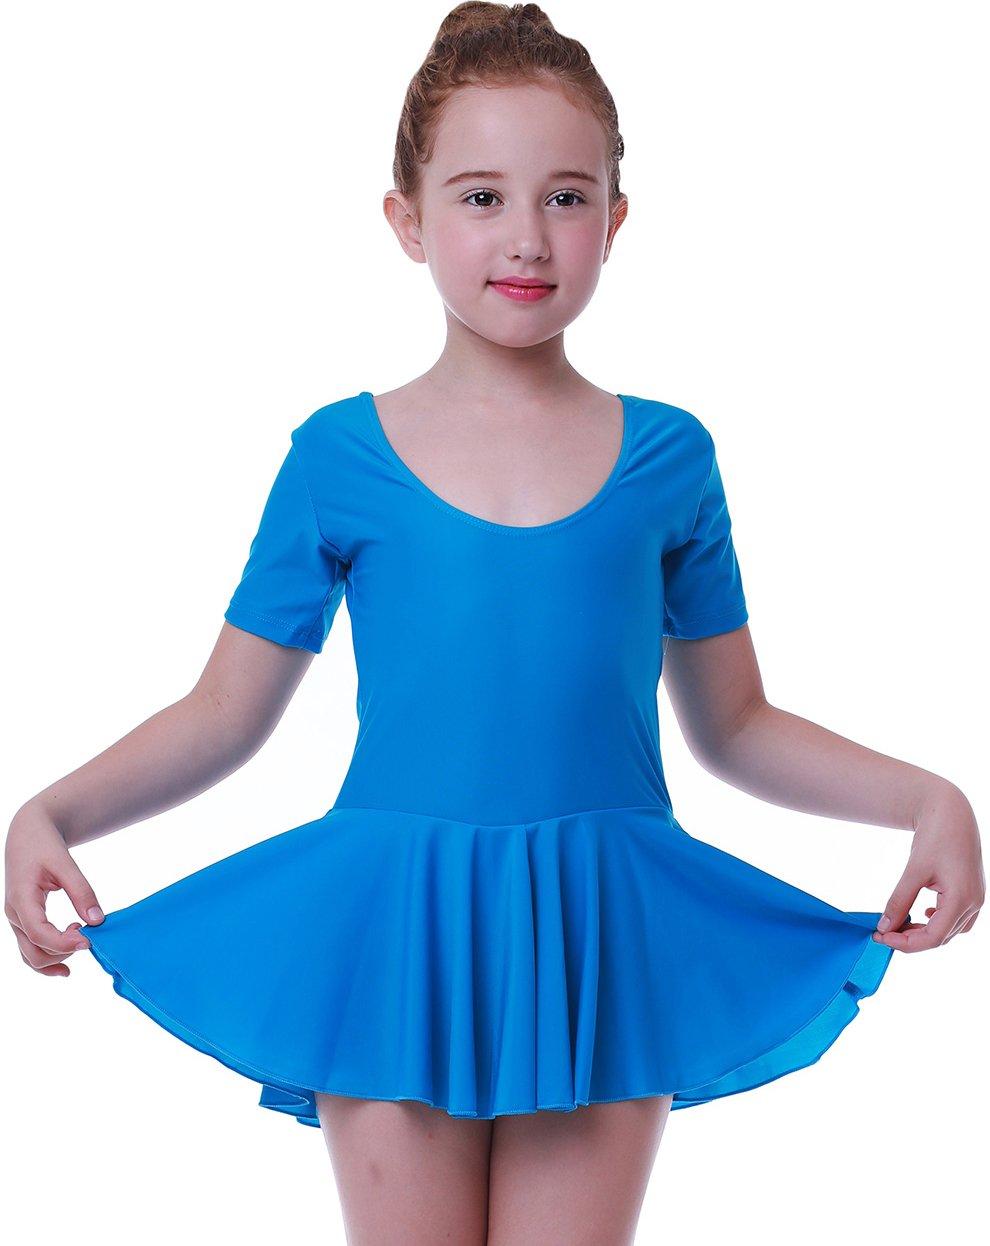 Seawhisper Maillot Ballet para Niñas Volantes 4 Estilos disponibles para elegir